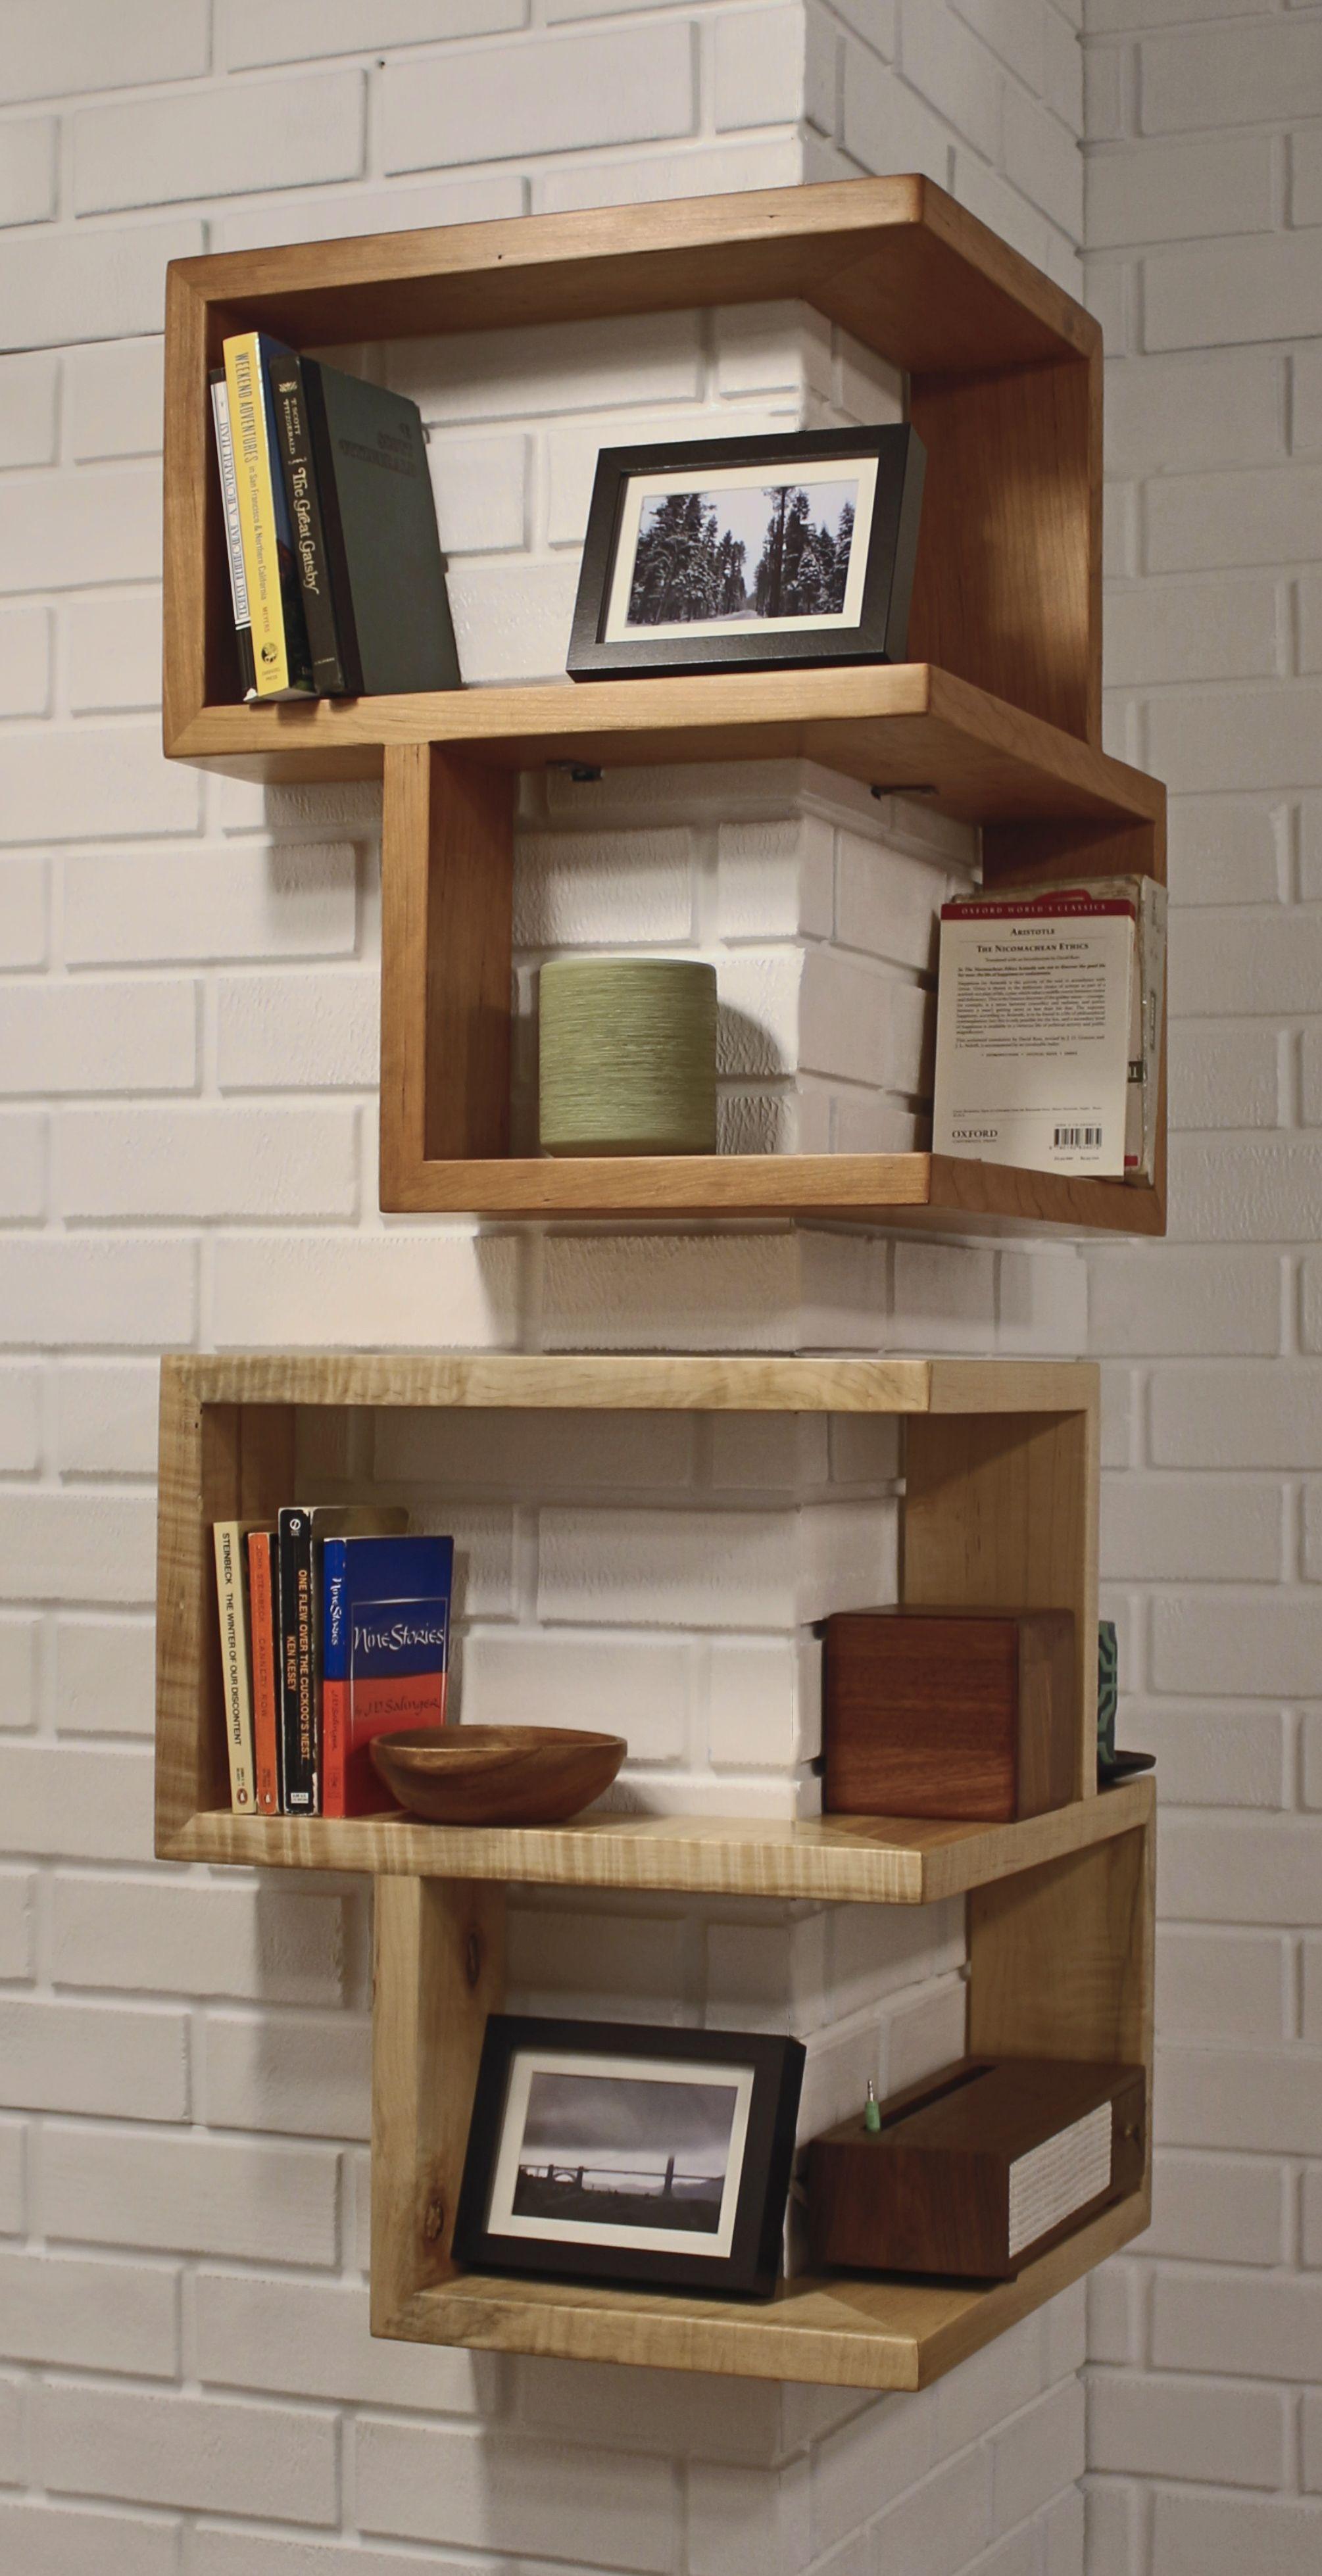 Splendid Shelves Bookshelf Design Wrap Around Shelf Idea Shelf Design Diy Projects To Make Your Home Look Wraps interior Corner Bookshelf Modern